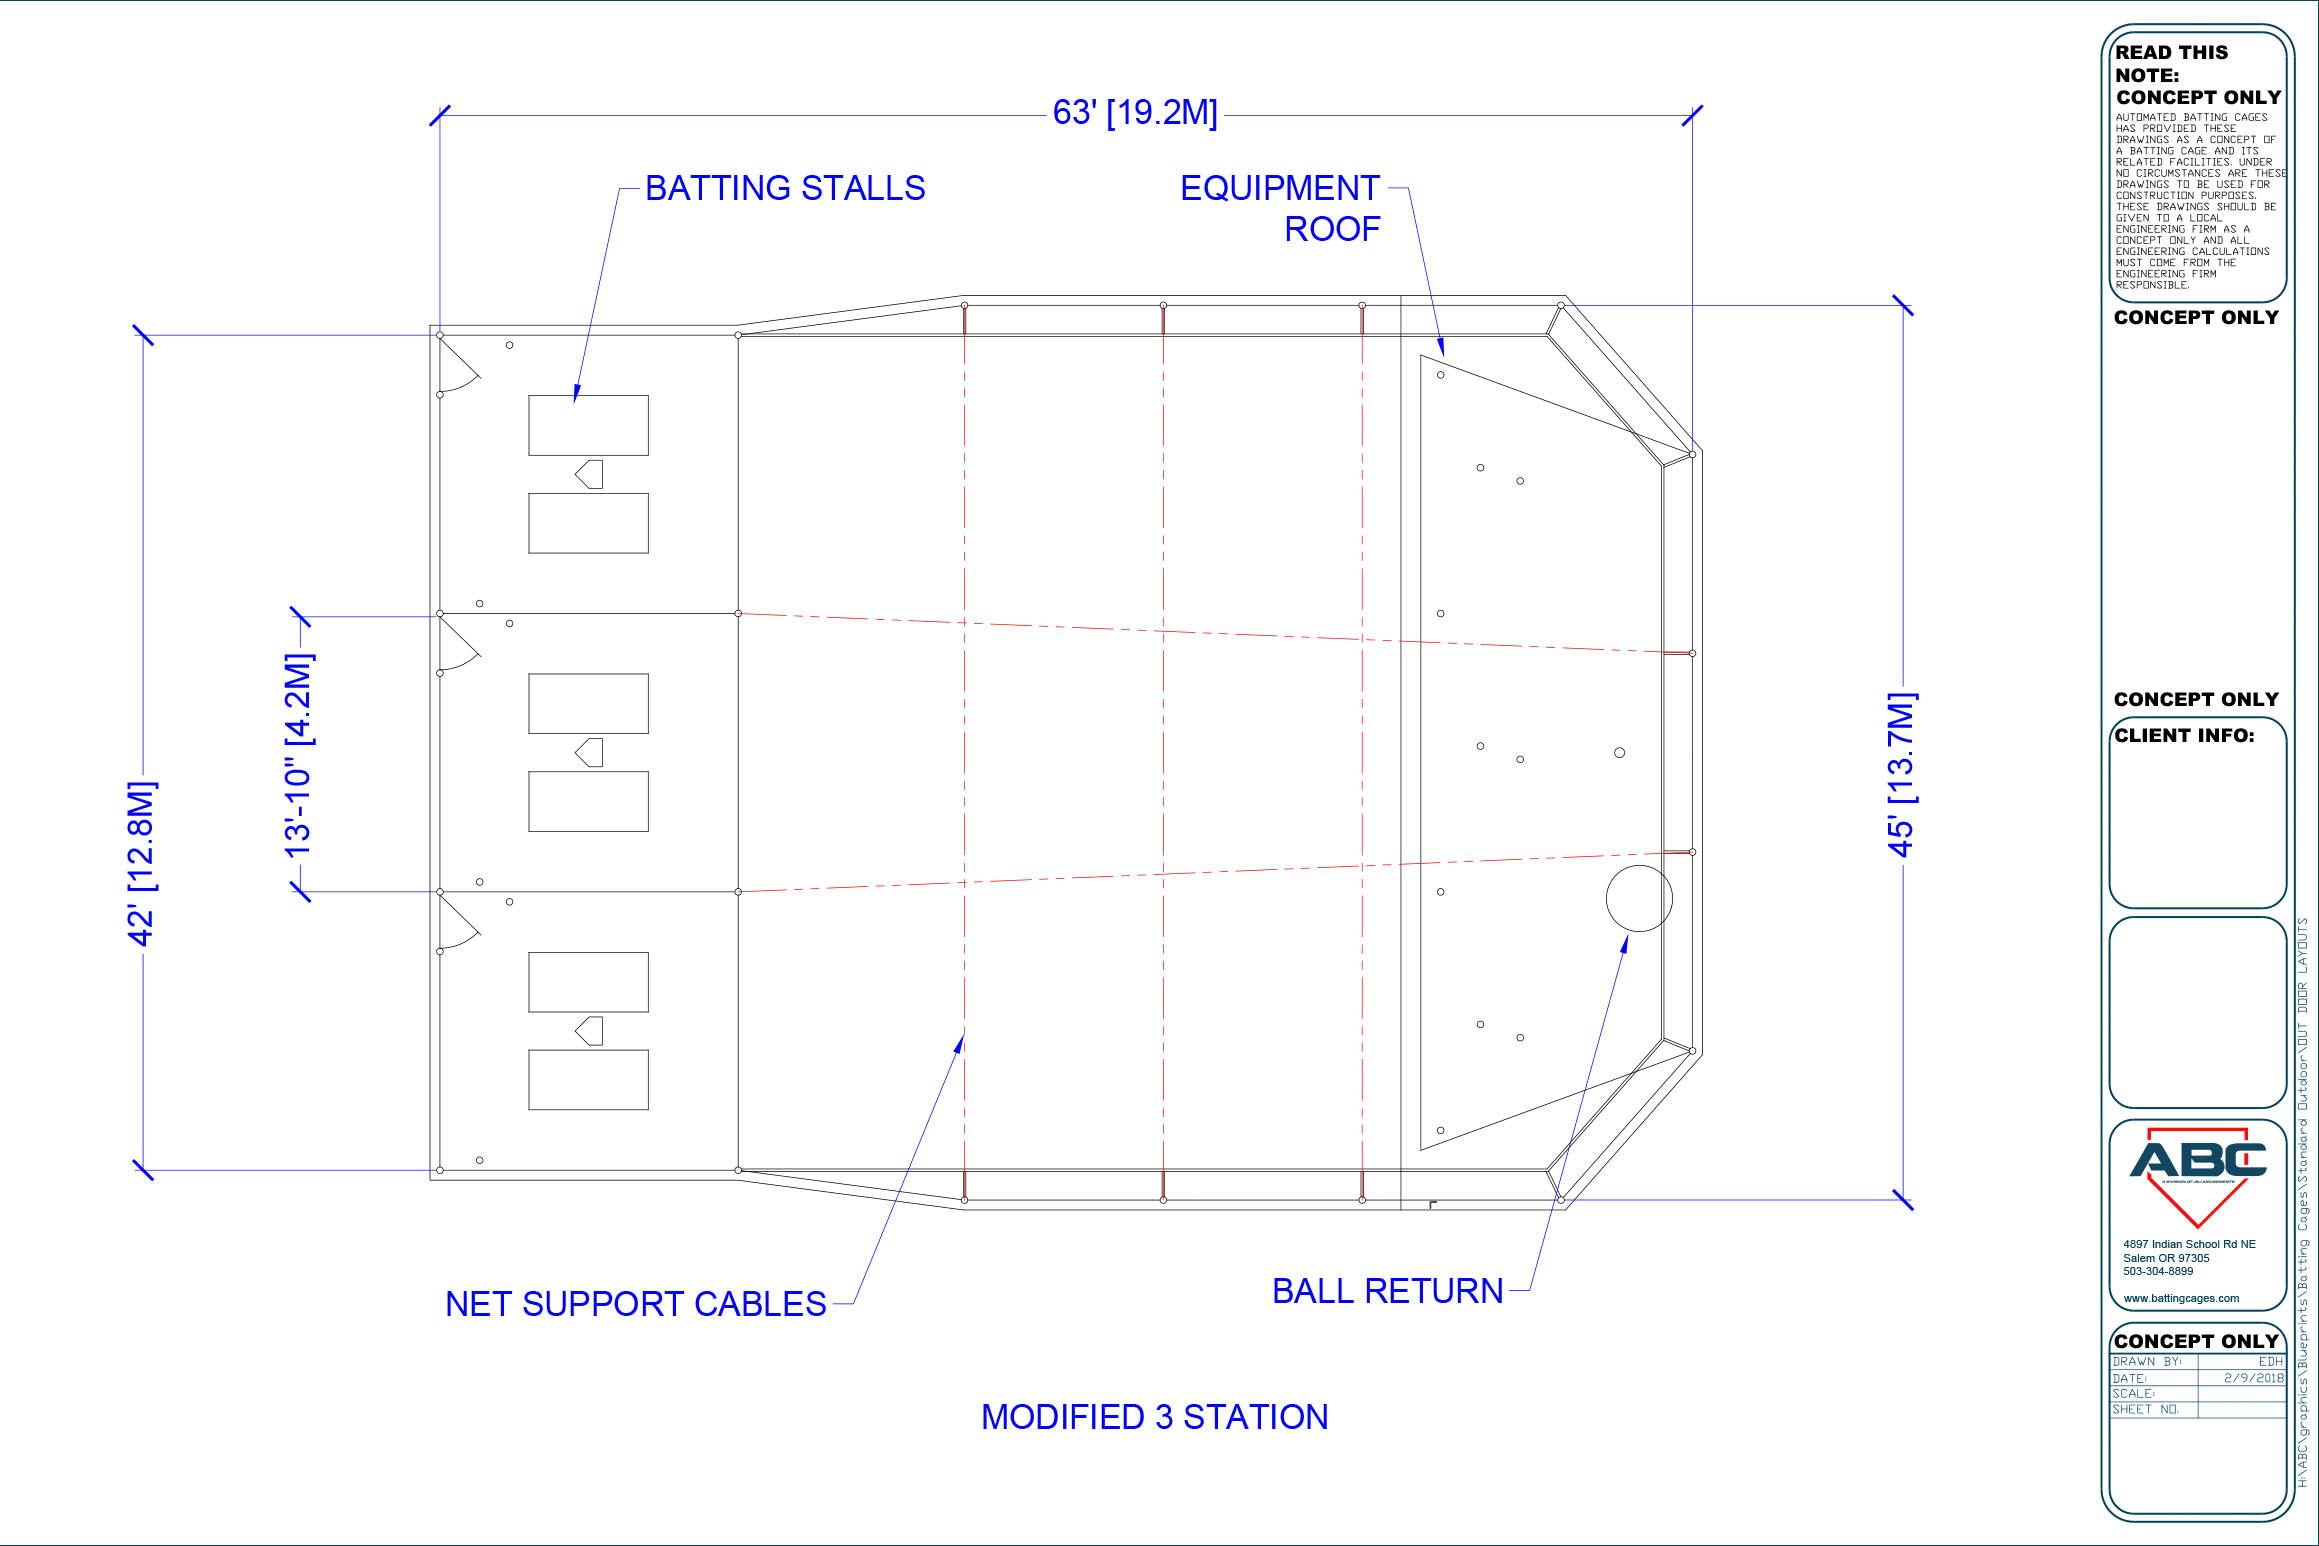 ABC modified 3 station blueprint